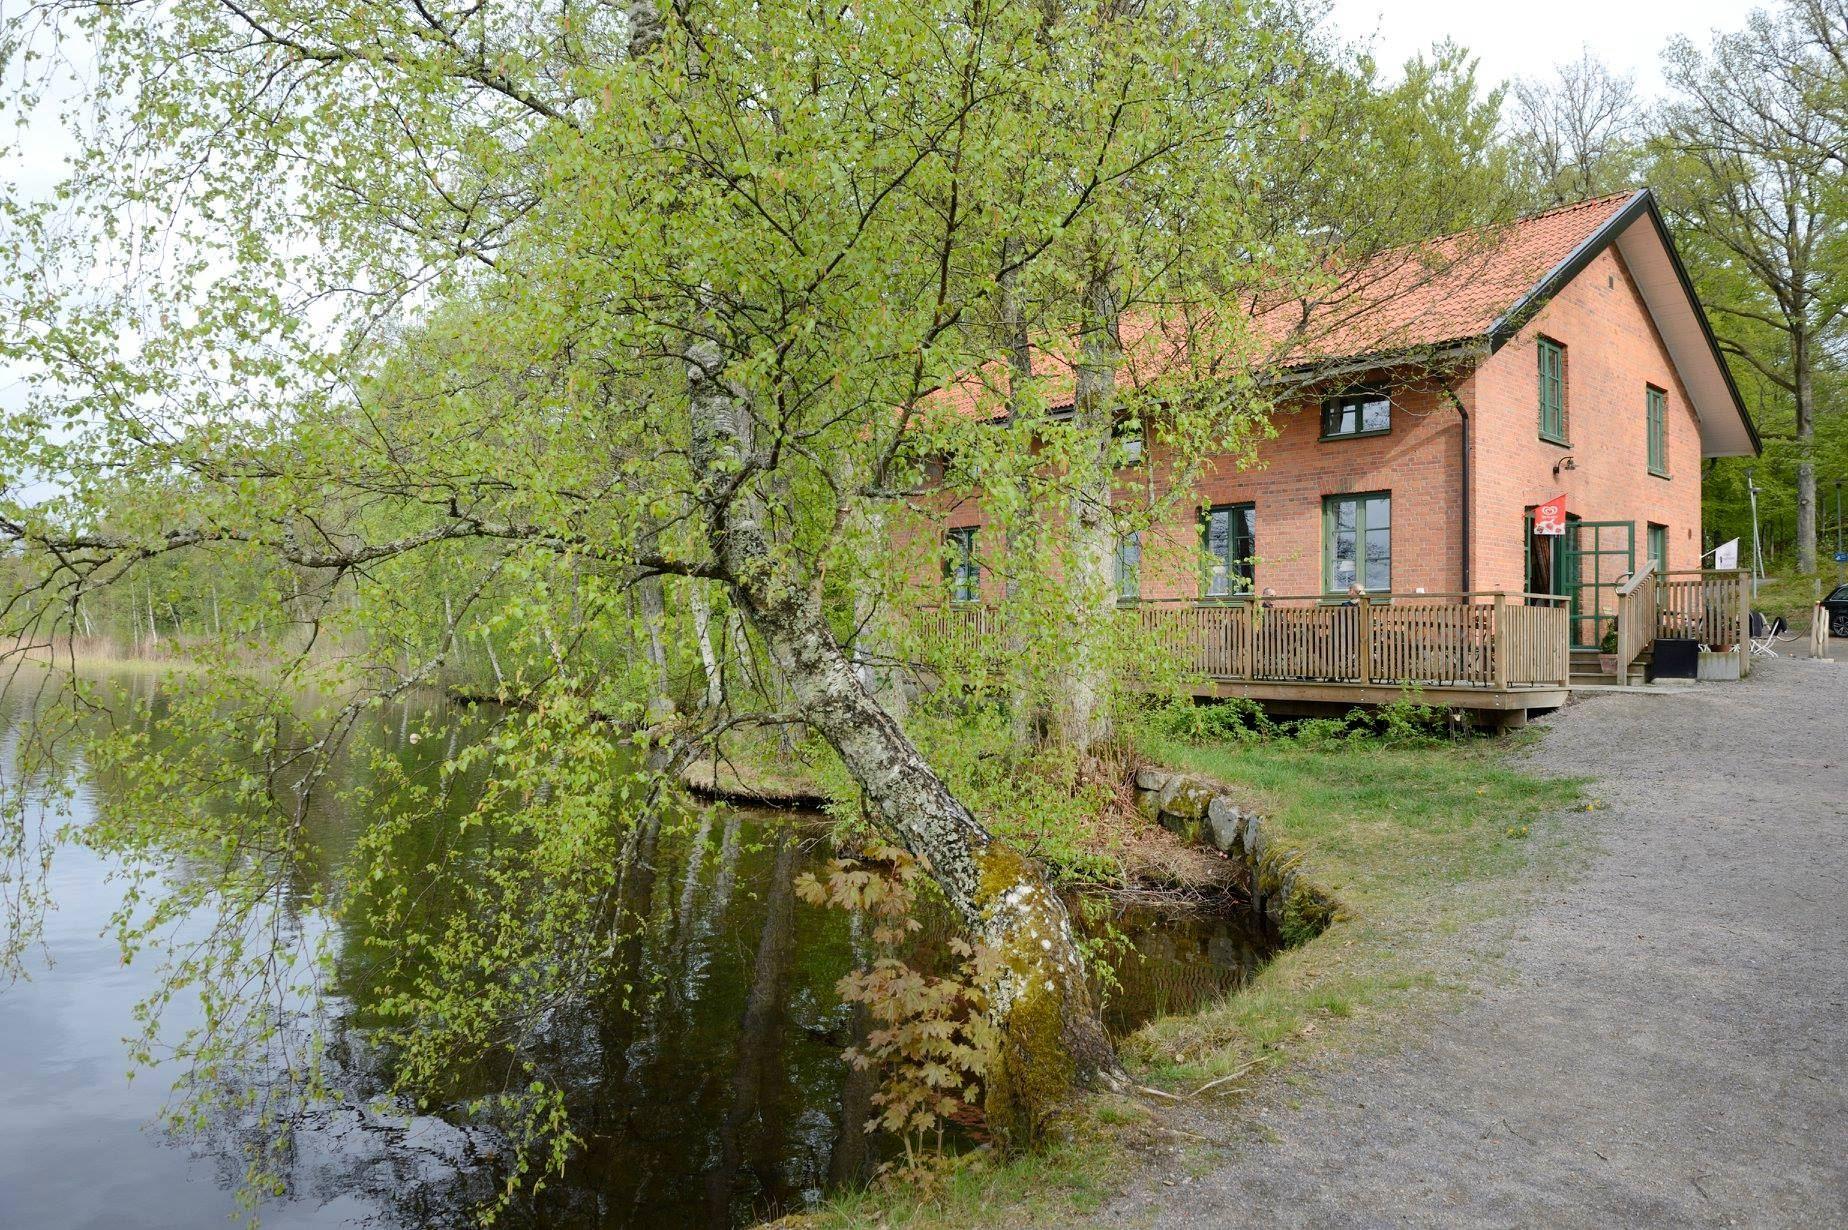 Brygghuset – Schlosscafé Teleborg